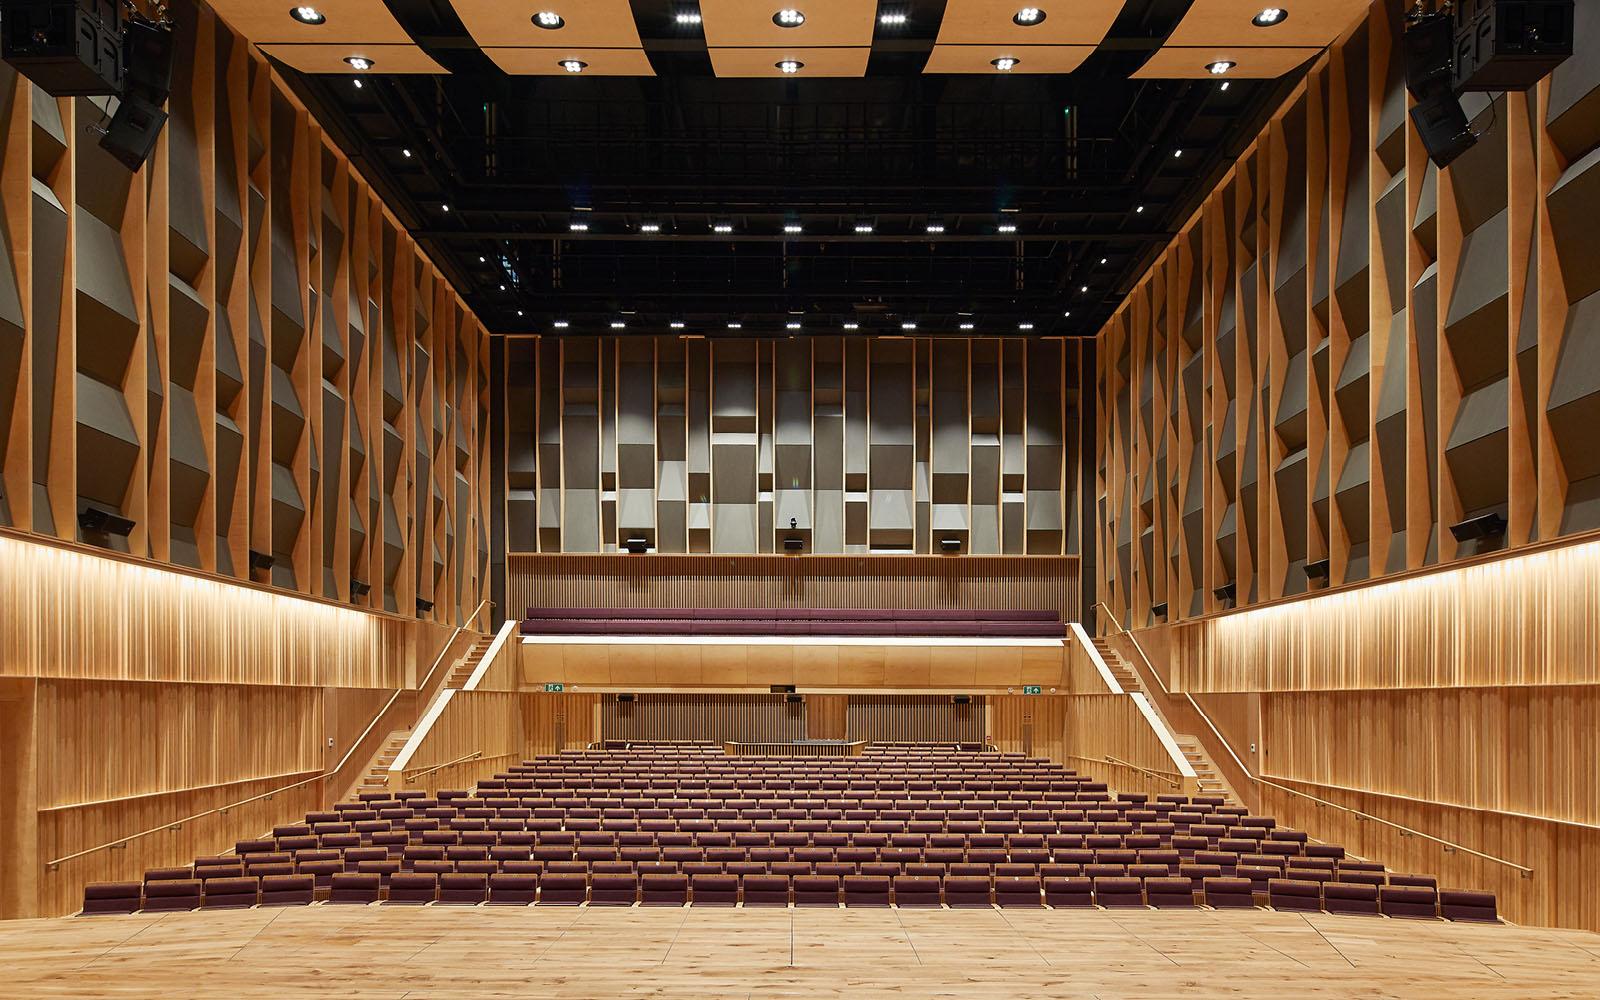 Birmingham Conservatoire Adrian Boult Hall